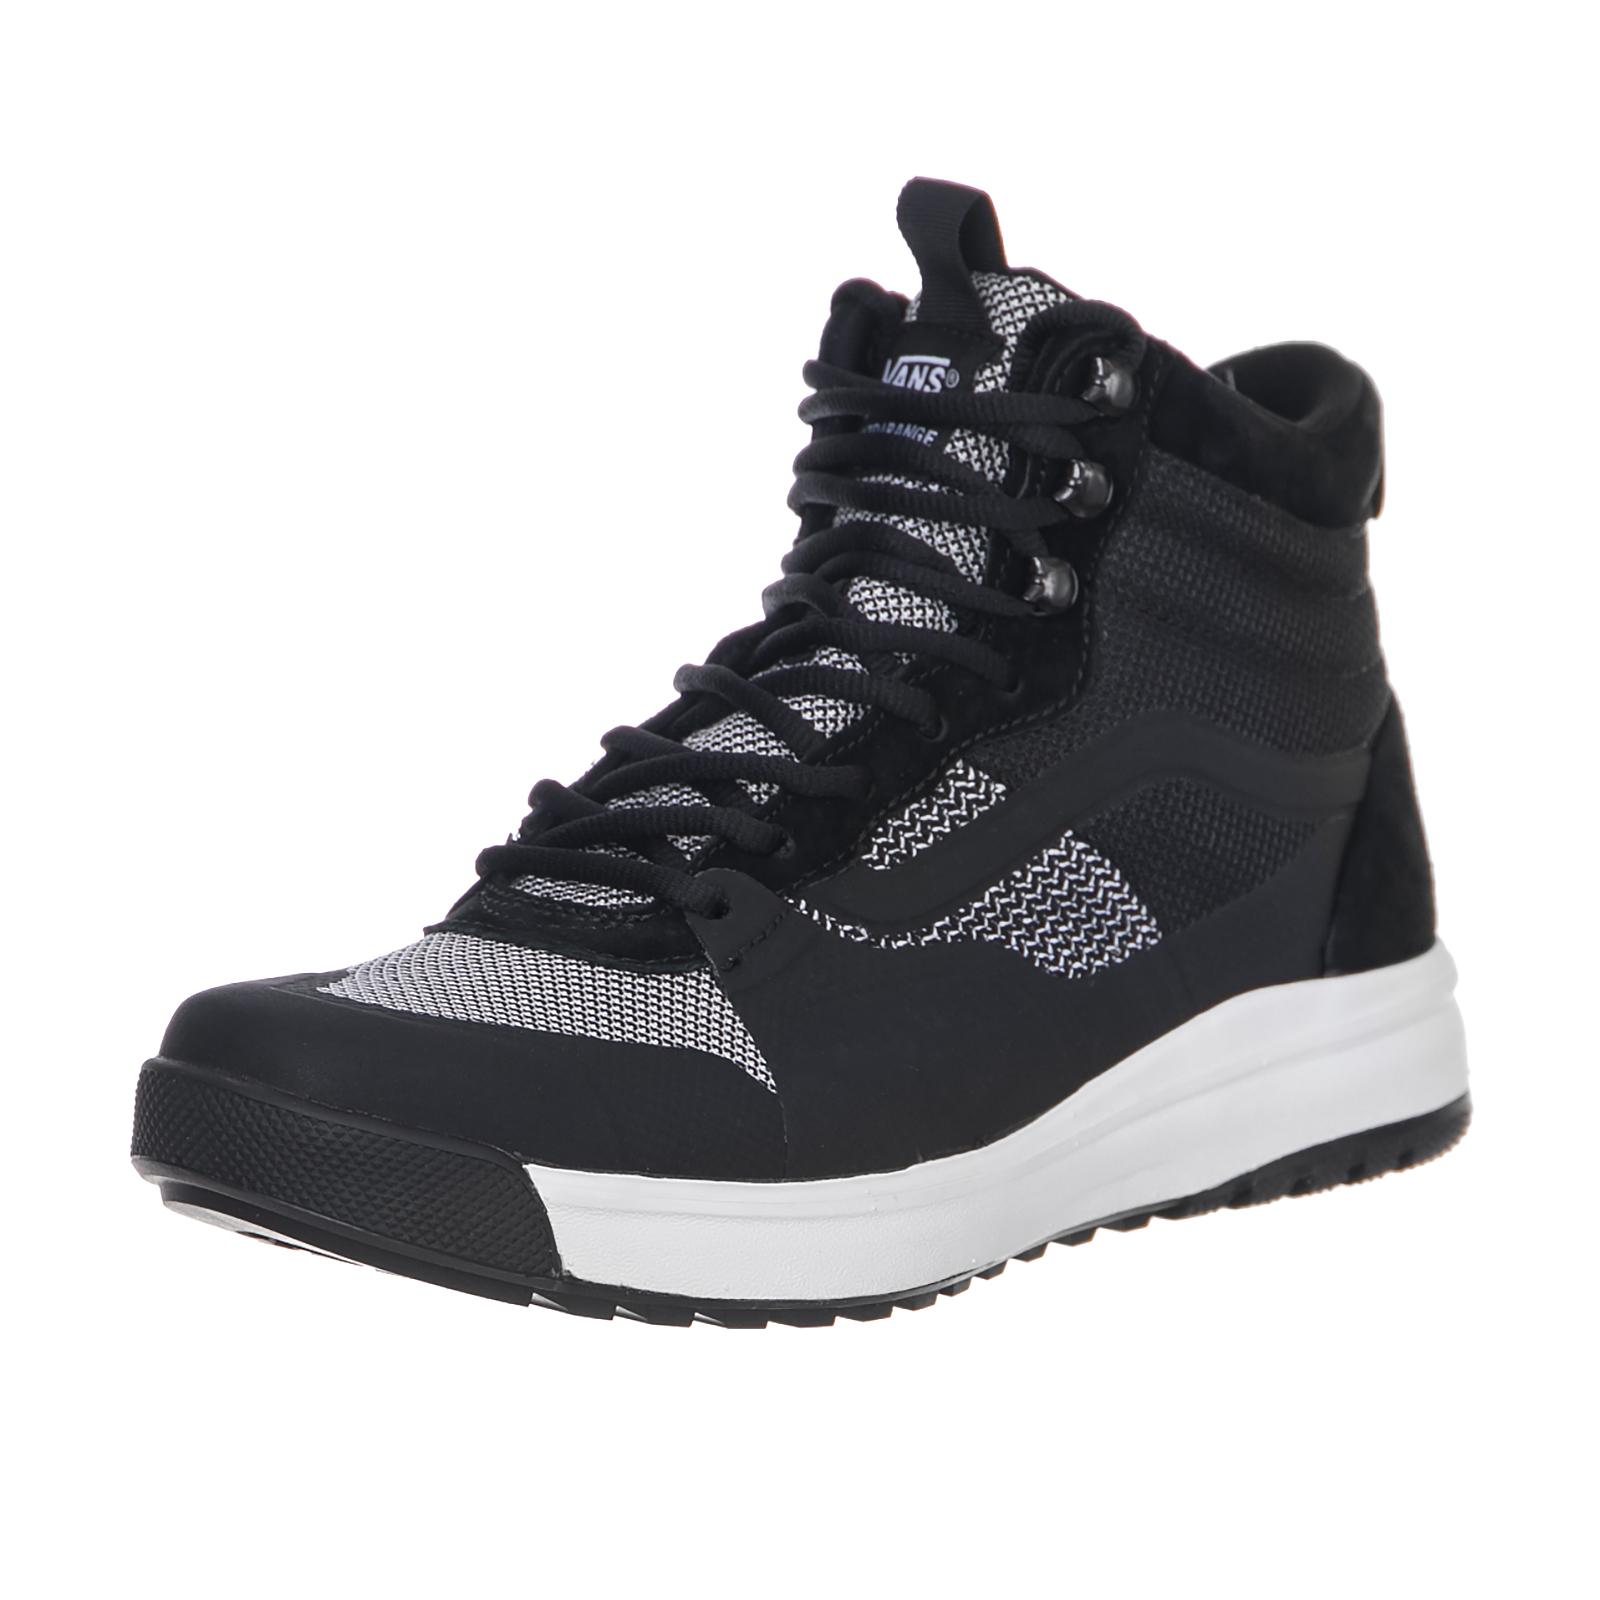 c68aba97874b Vans Sneakers Ua Ultrarange Hi Dx (Yc Knit) Bl Black